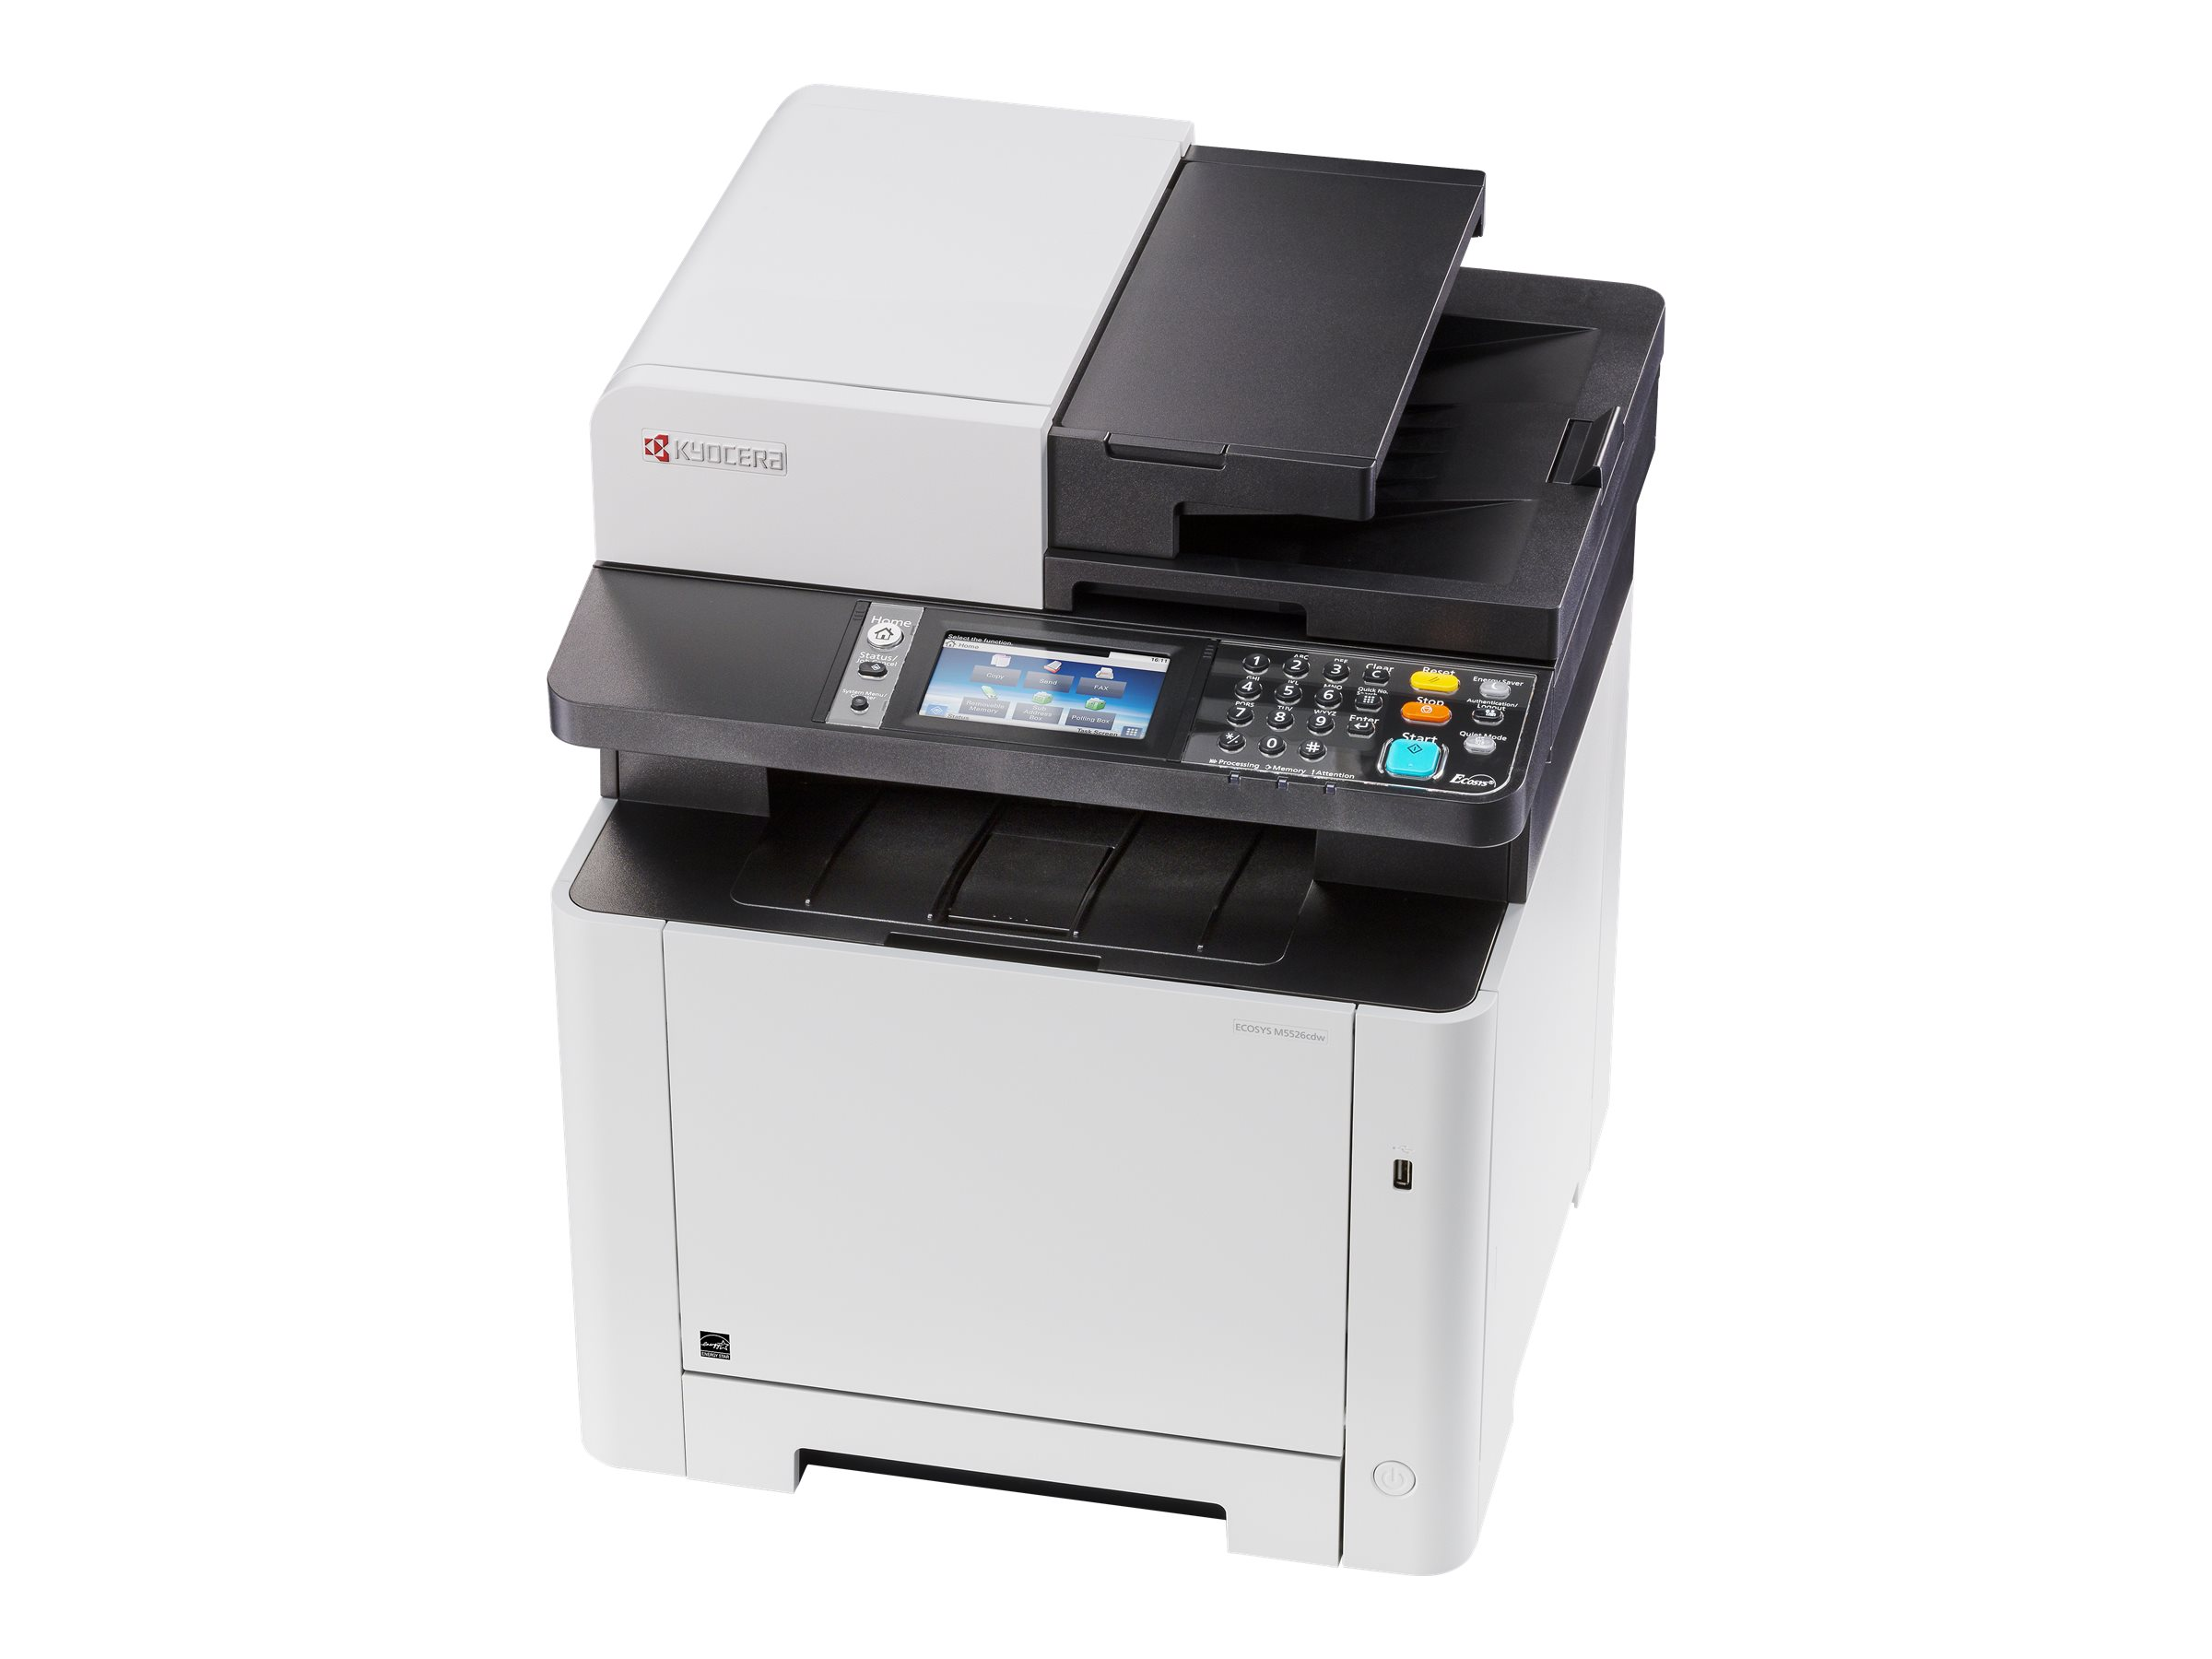 Kyocera ECOSYS M5526cdw - Multifunktionsdrucker - Farbe - Laser - A4 (210 x 297 mm)